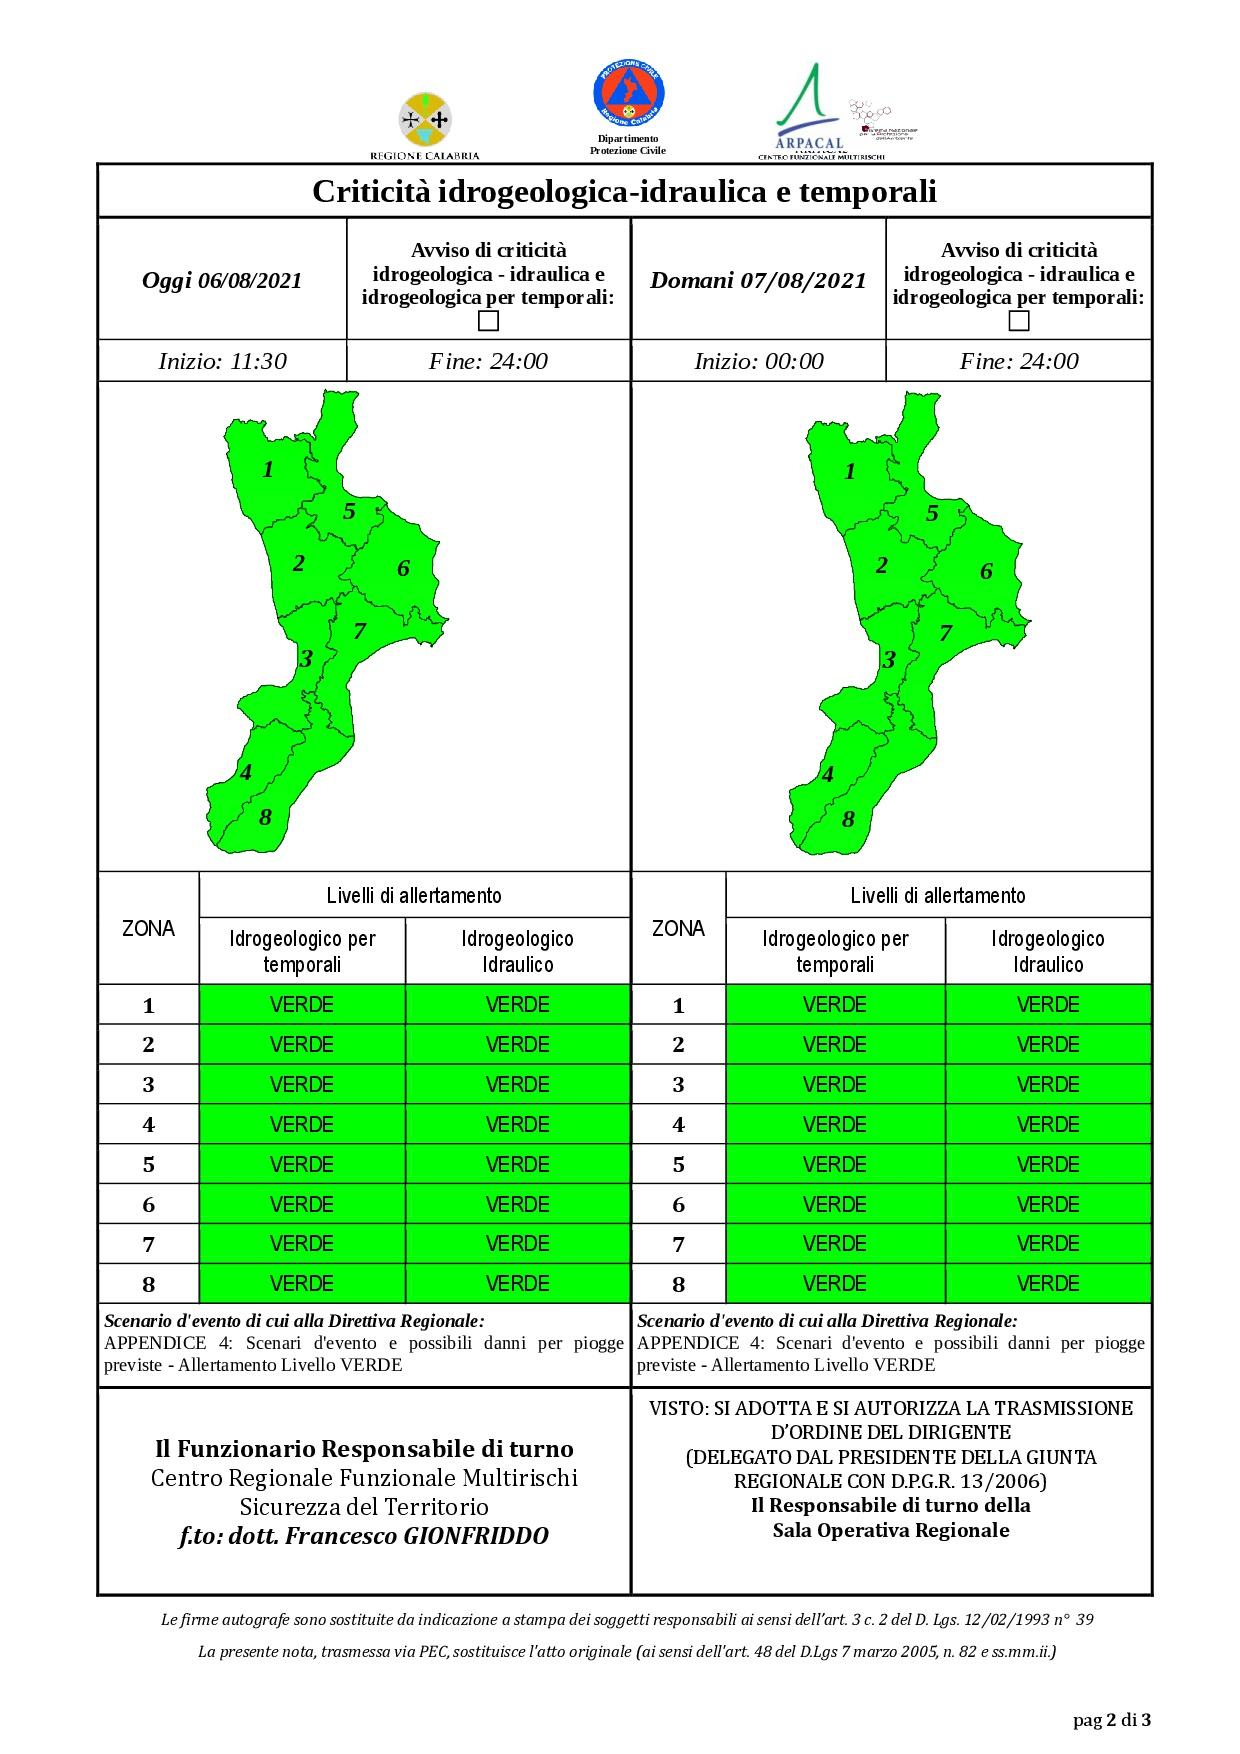 Criticità idrogeologica-idraulica e temporali in Calabria 06-08-2021